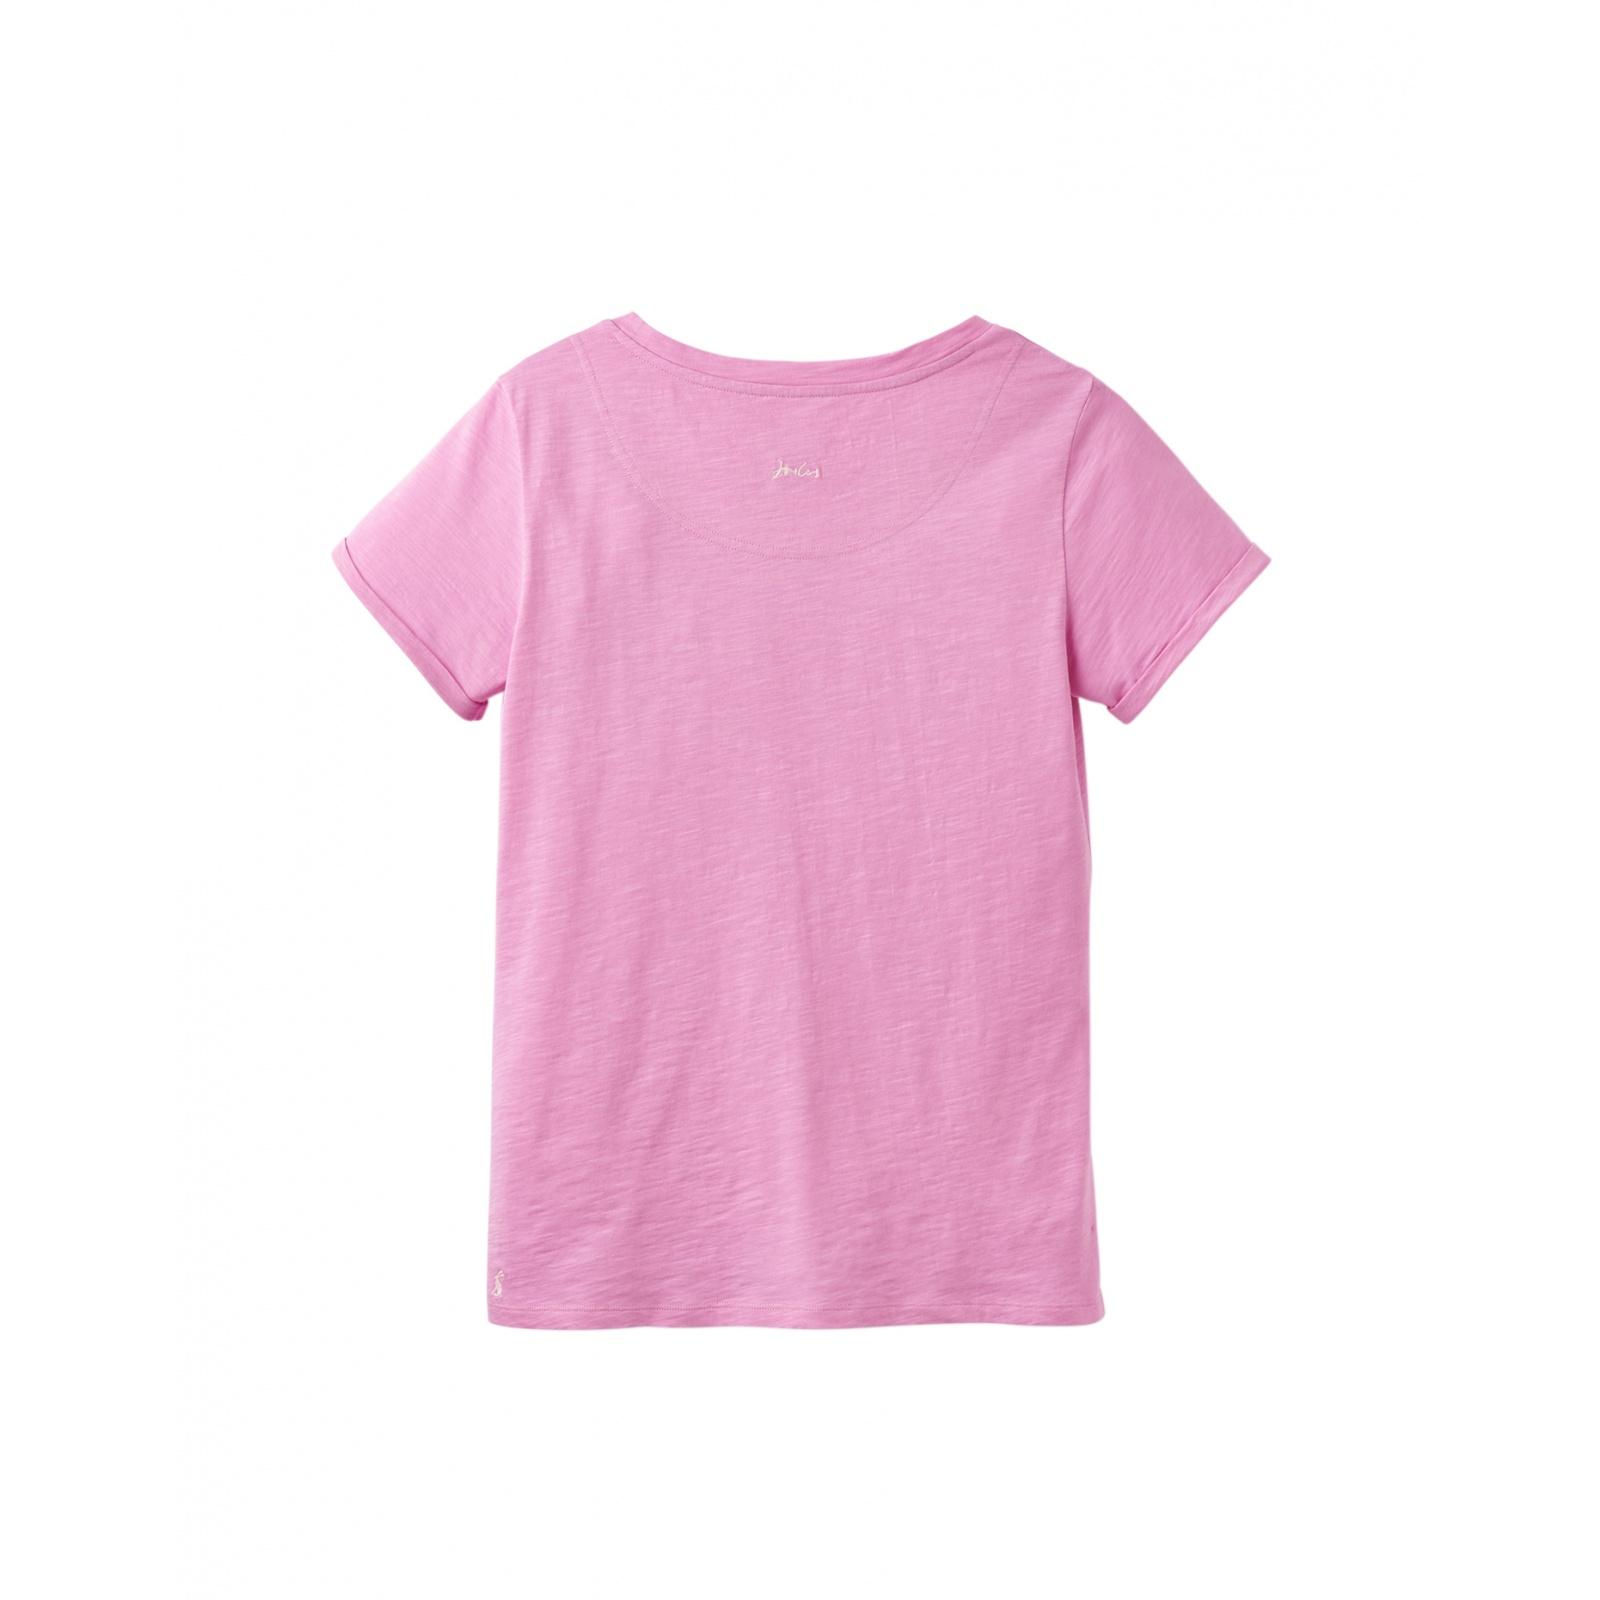 Joules-Nessa-ligero-Jersey-Camiseta-SS19 miniatura 25